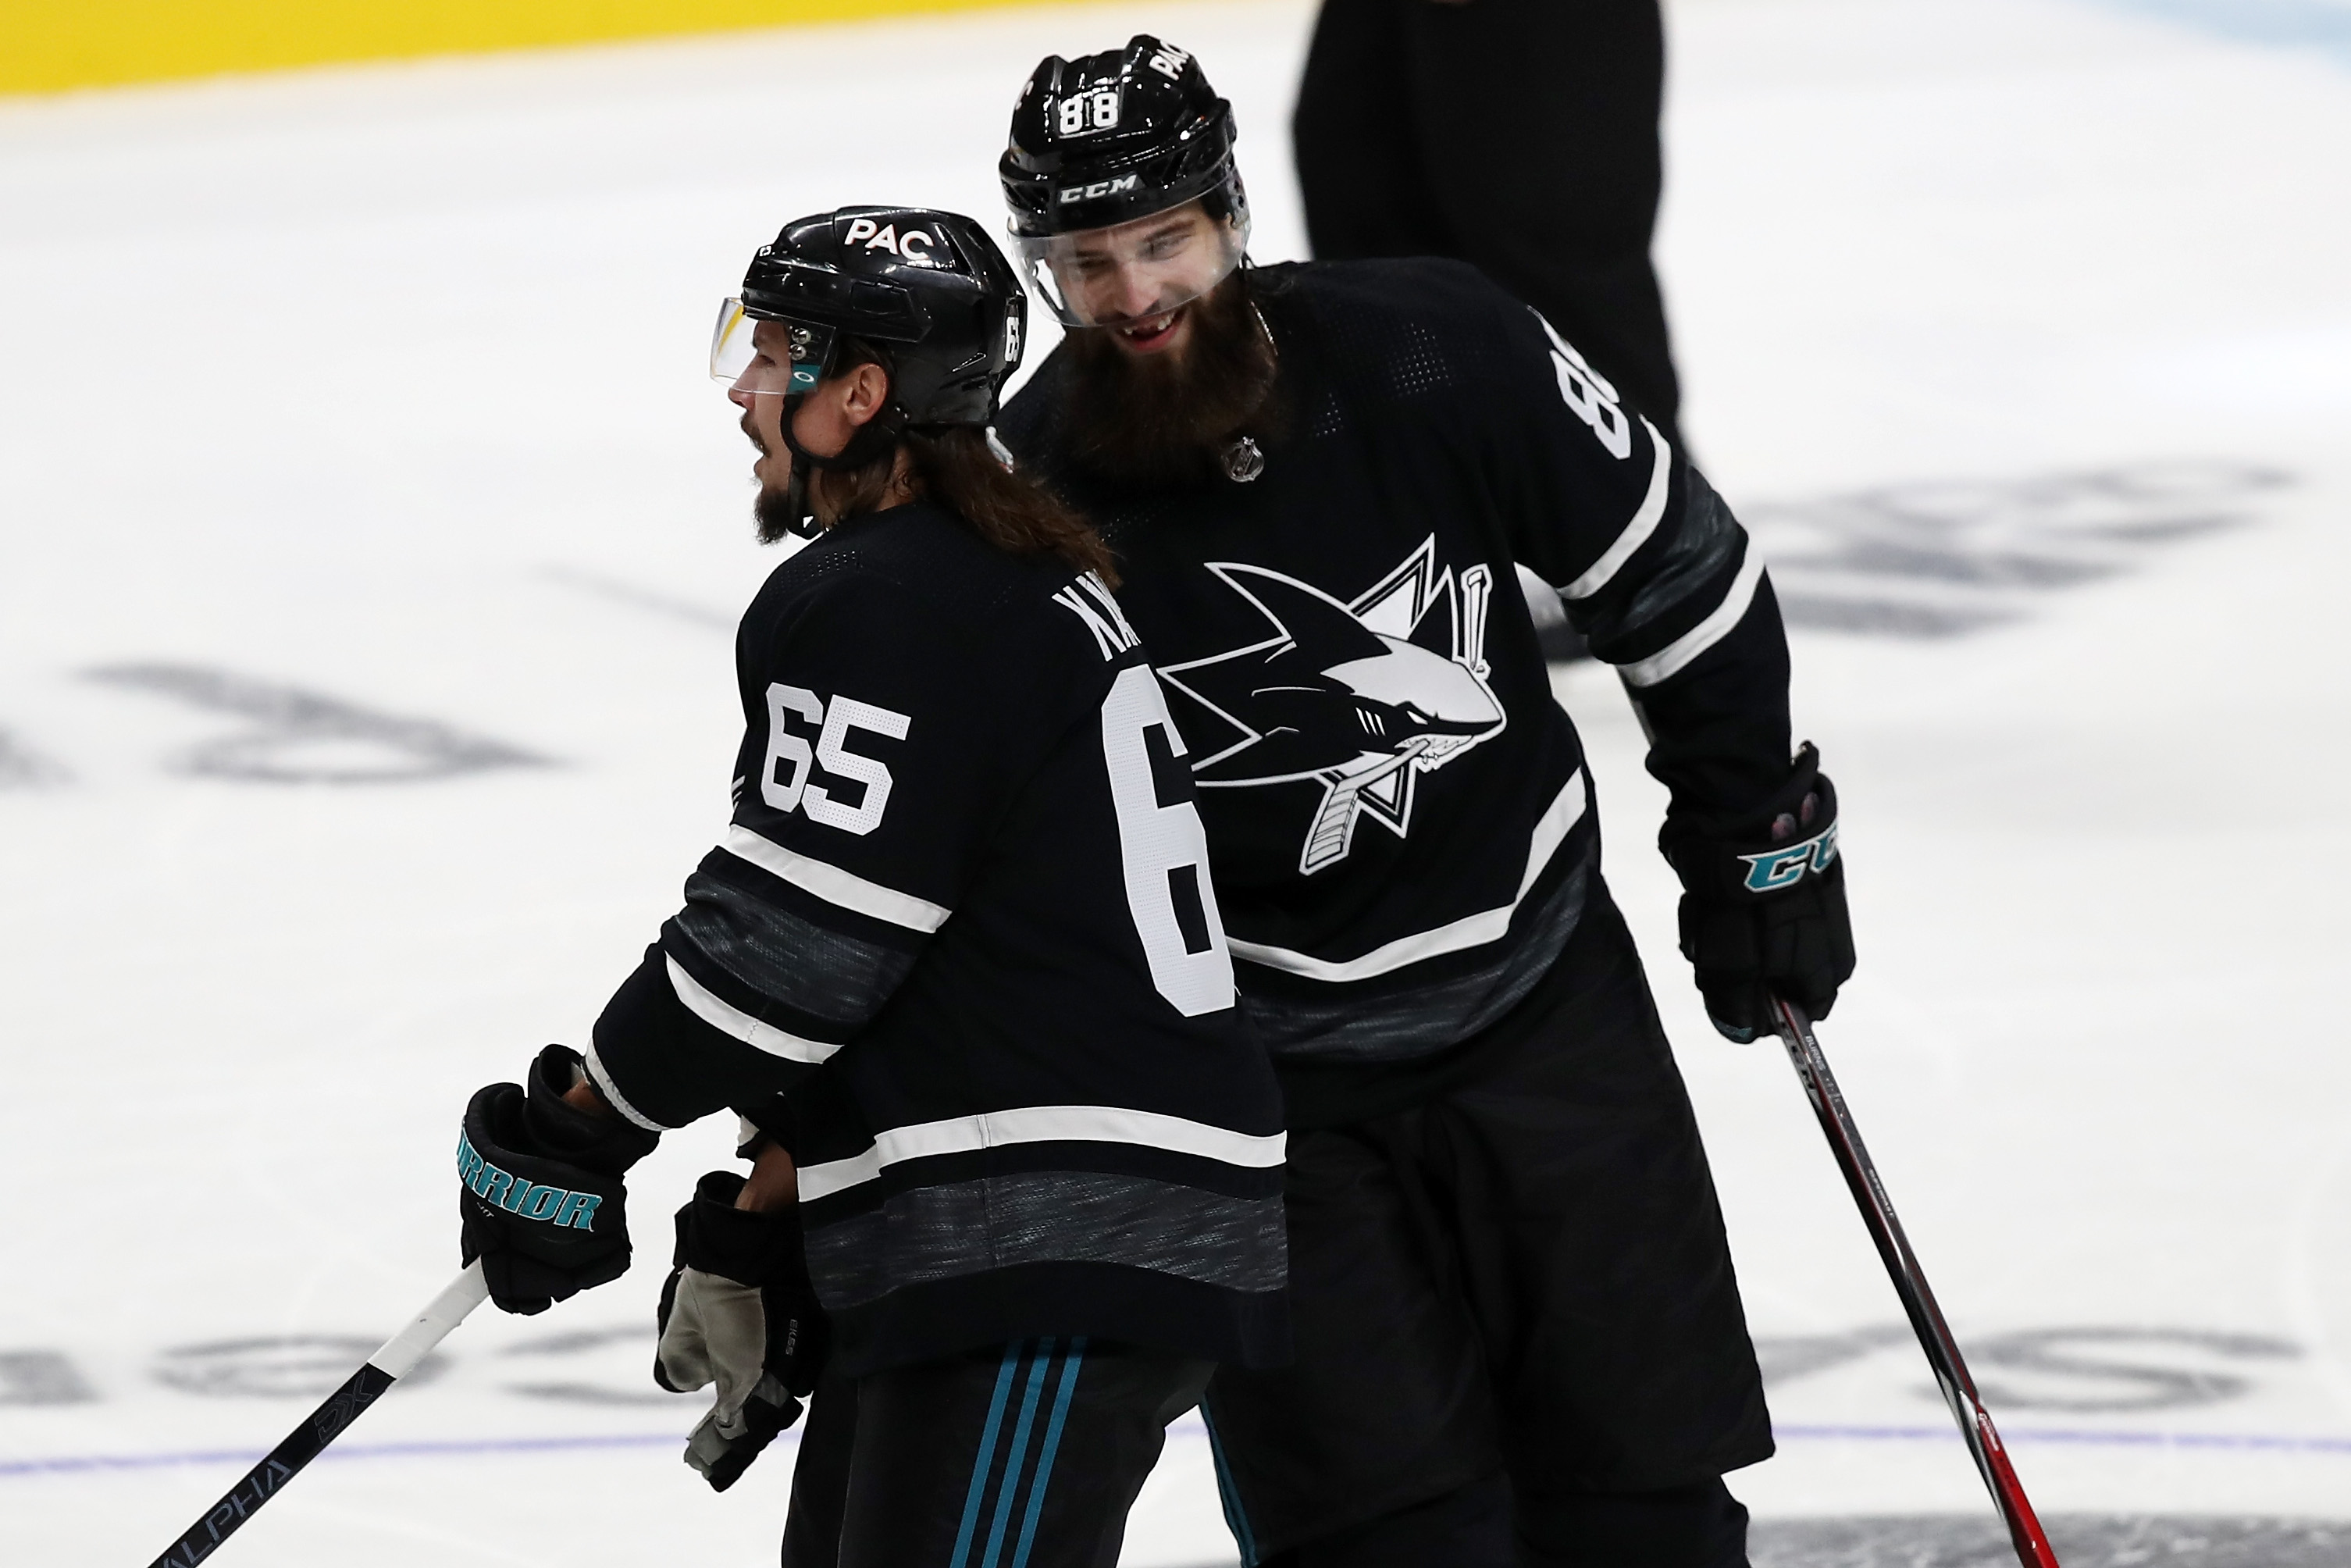 SAN JOSE, CA - JANUARY 26: Erik Karlsson #65 and Brent Burns #88 of the San Jose Sharks react to a goal during the 2019 Honda NHL All-Star Game at SAP Center on January 26, 2019 in San Jose, California.